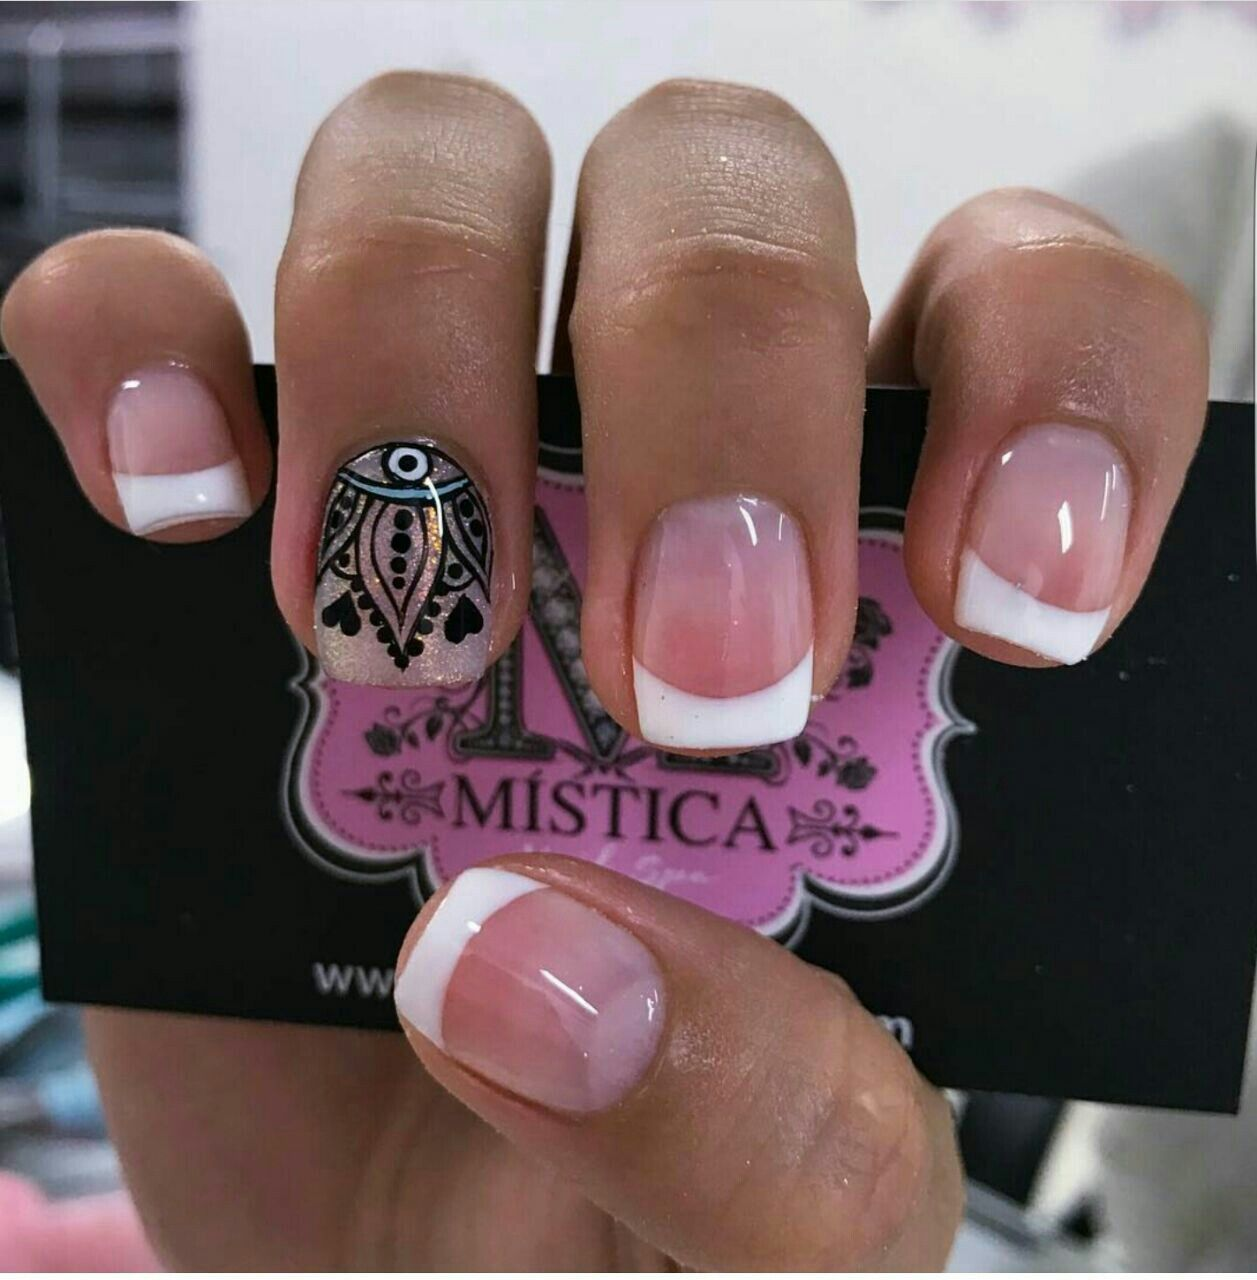 Pin by Ana Karen Estupiñan on uñas | Pinterest | Manicure, Magic ...